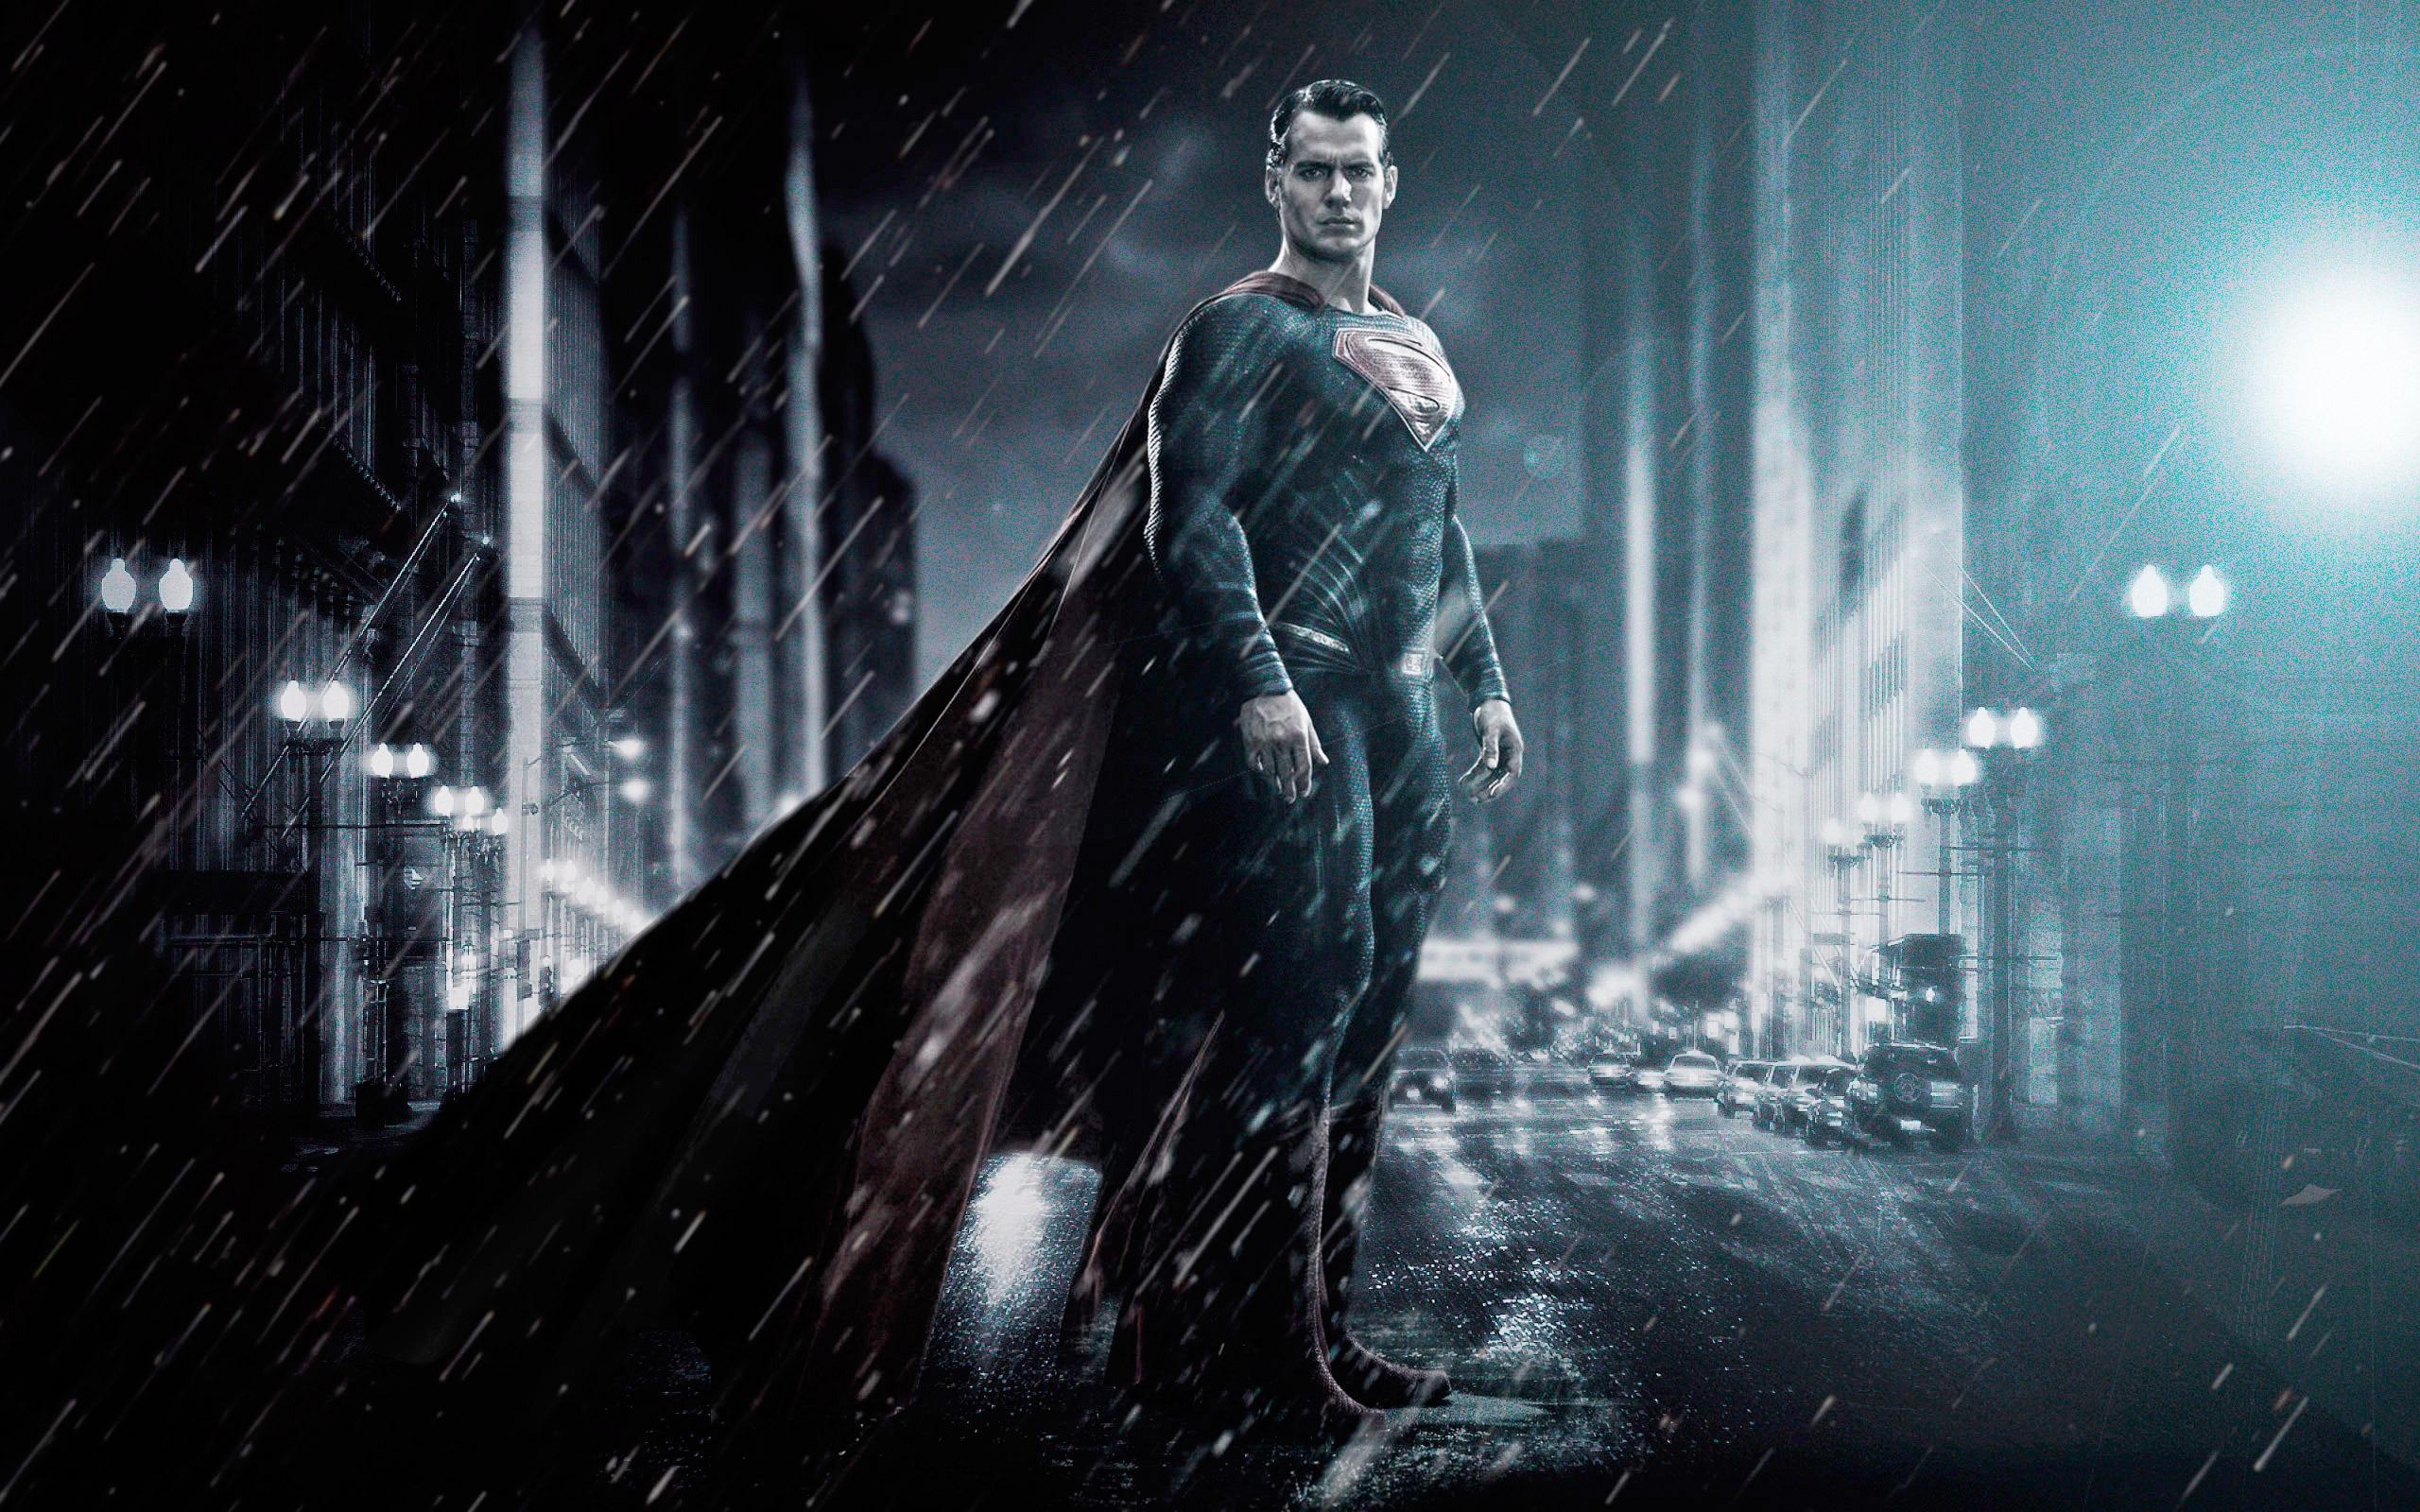 Oblivion 2013 Movie 4k Hd Desktop Wallpaper For 4k Ultra: Batman Vs Superman 4K Wallpaper